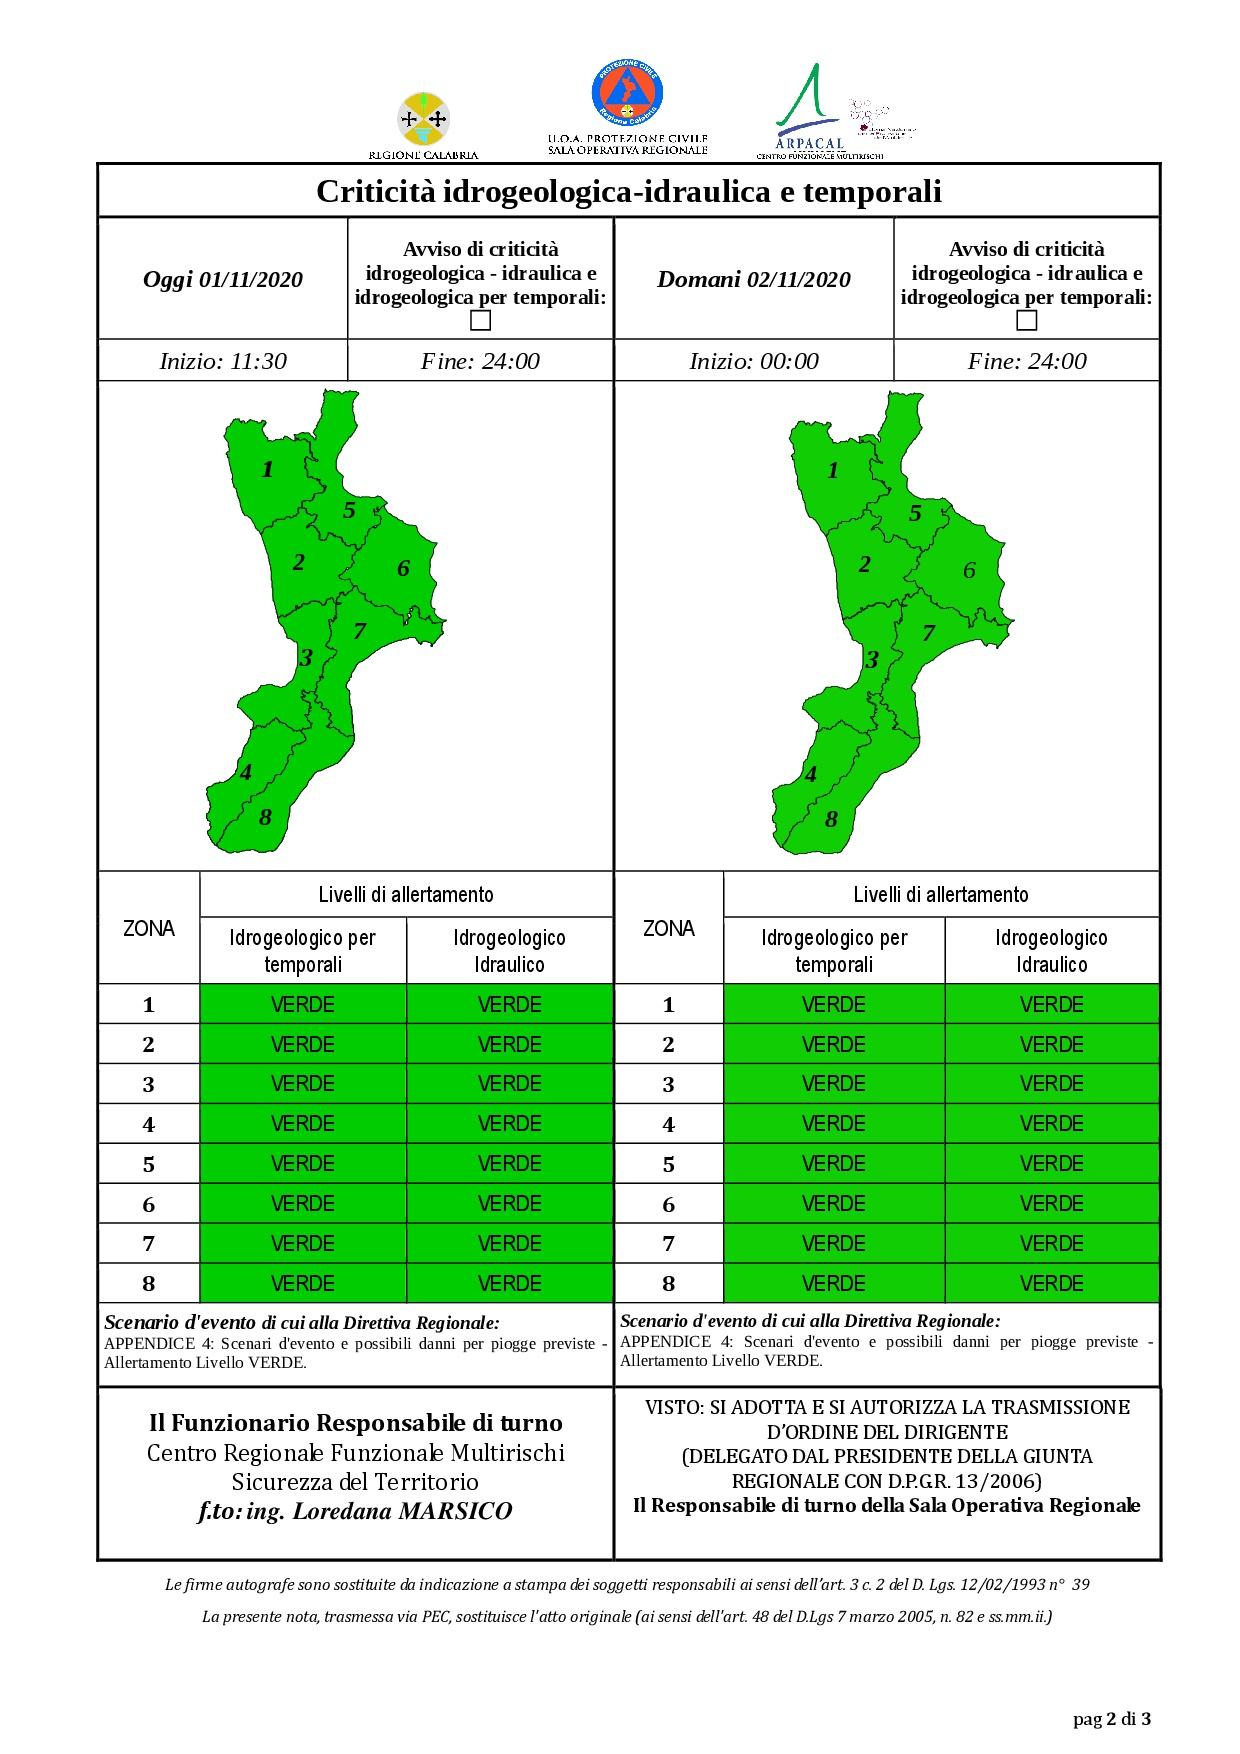 Criticità idrogeologica-idraulica e temporali in Calabria 01-11-2020